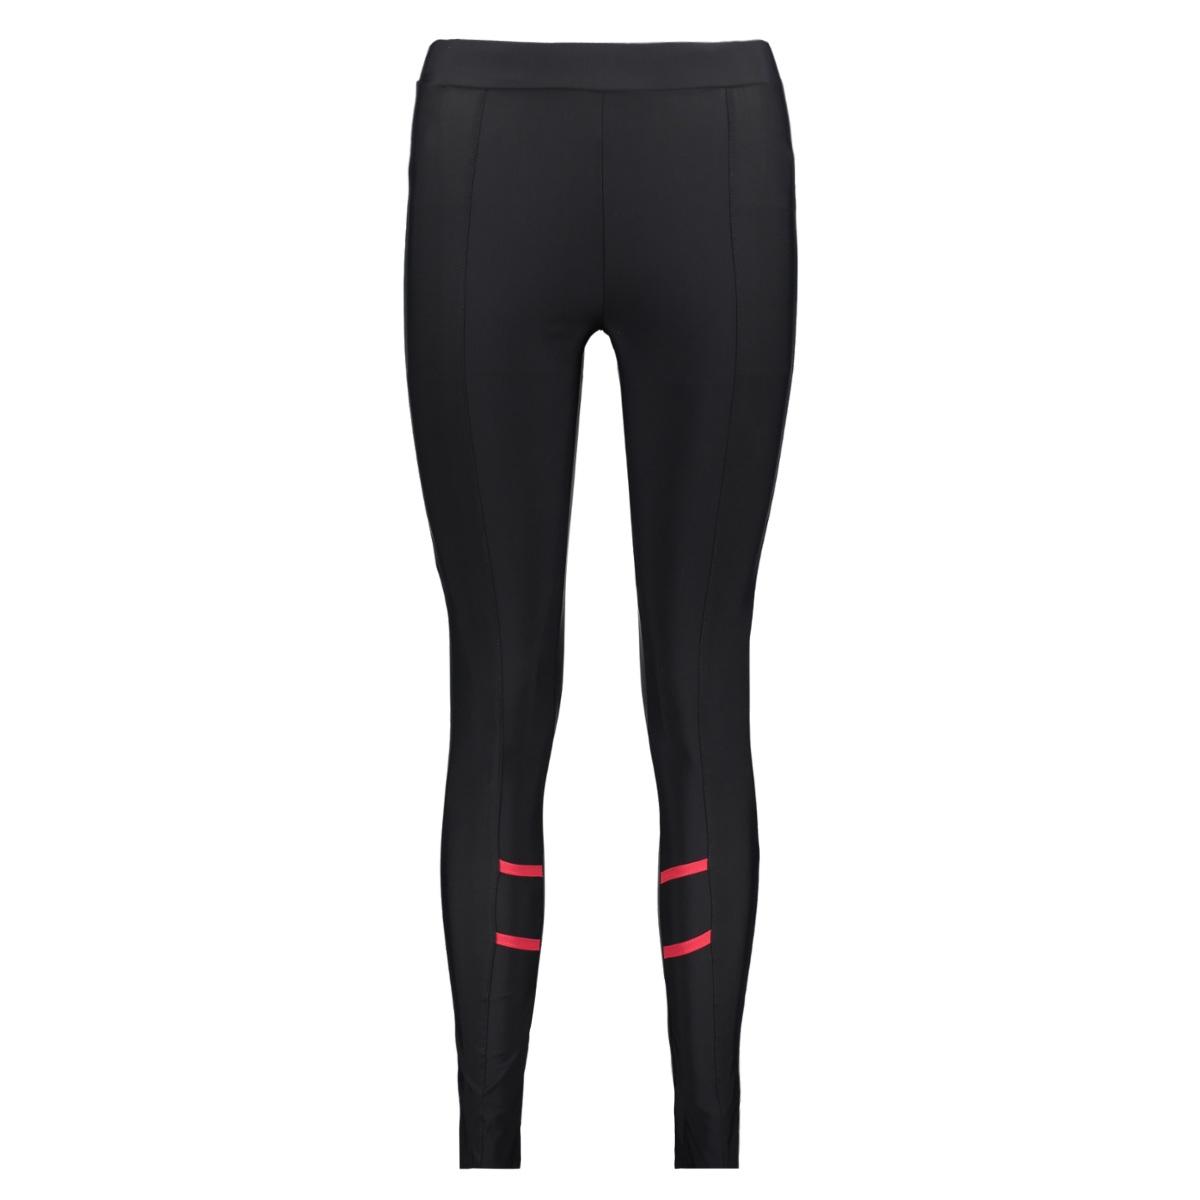 fanny travel pant zoso legging black/red